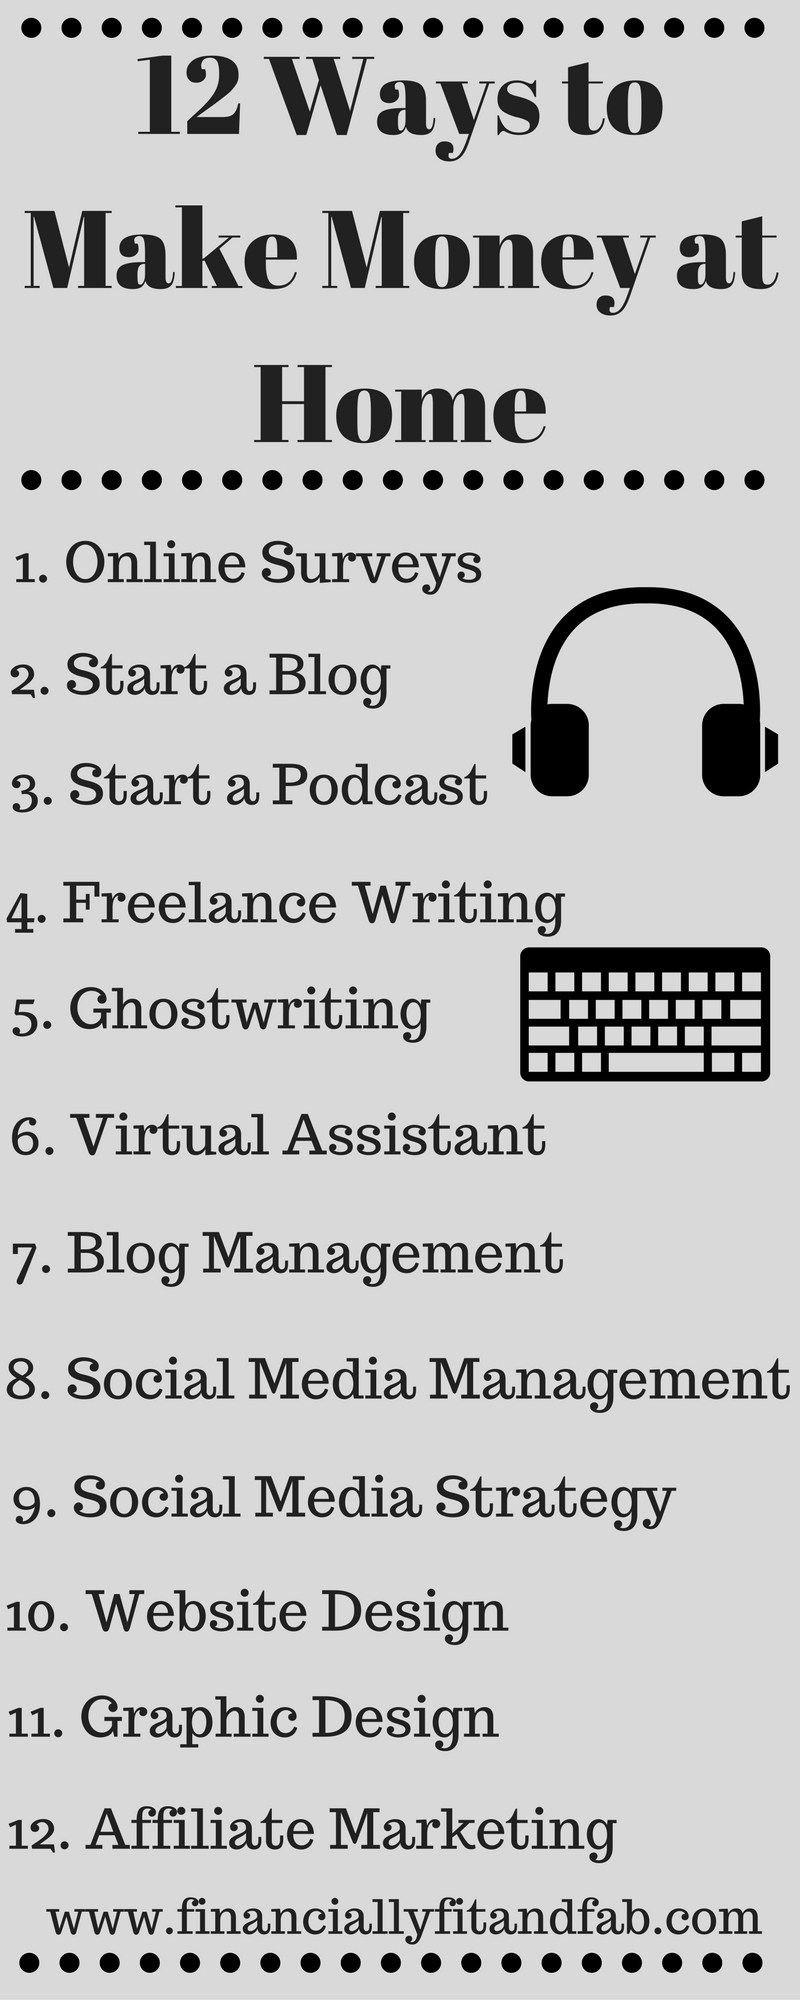 12 ways to make money at home | online side hustles | make money